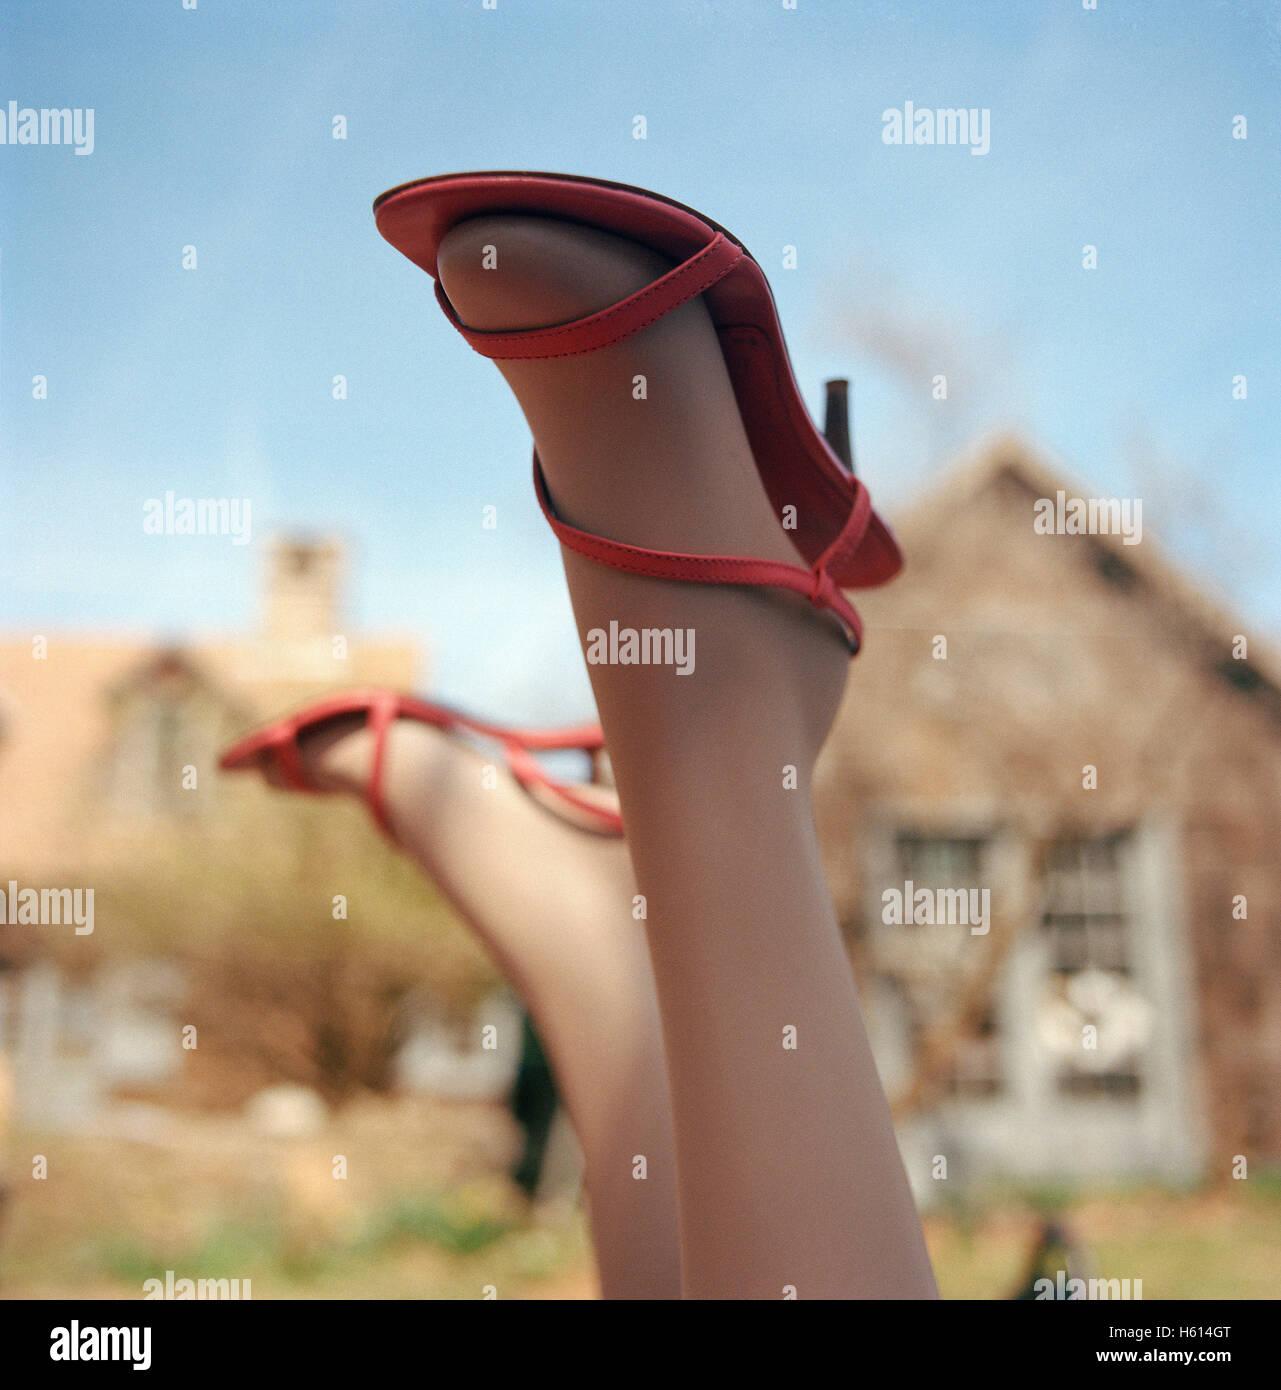 Pink High Heels on Mannequin Upside Down - Stock Image